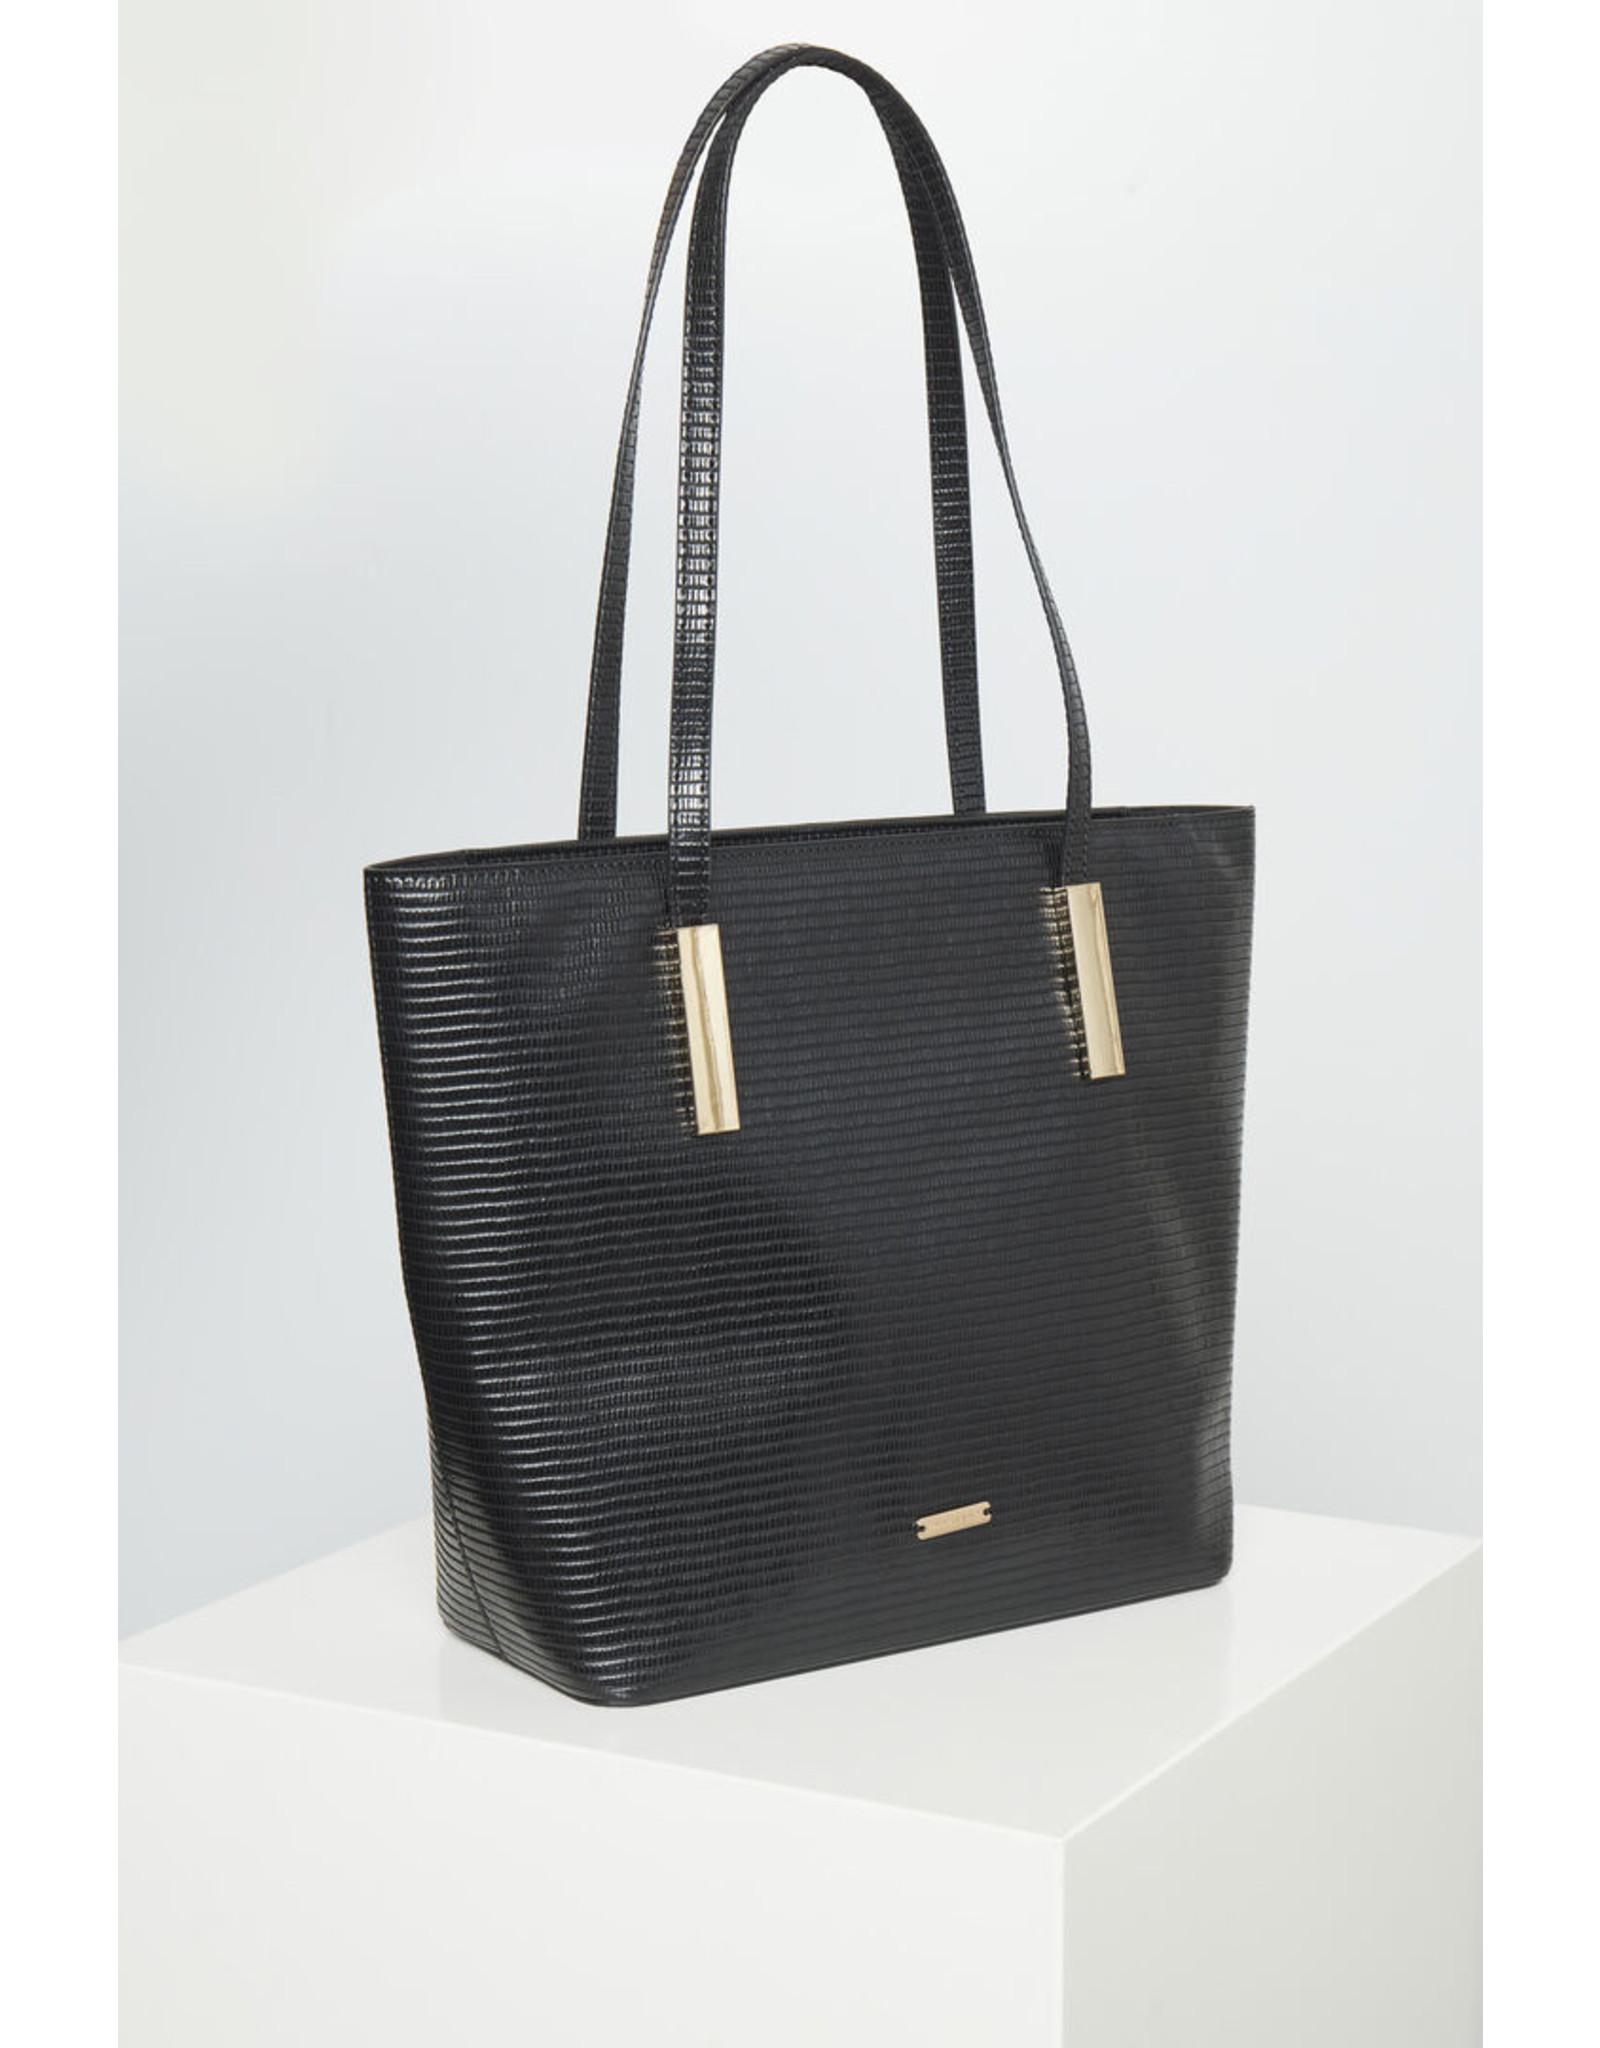 Karen by Simonsen Dafne Medium Tote Bag